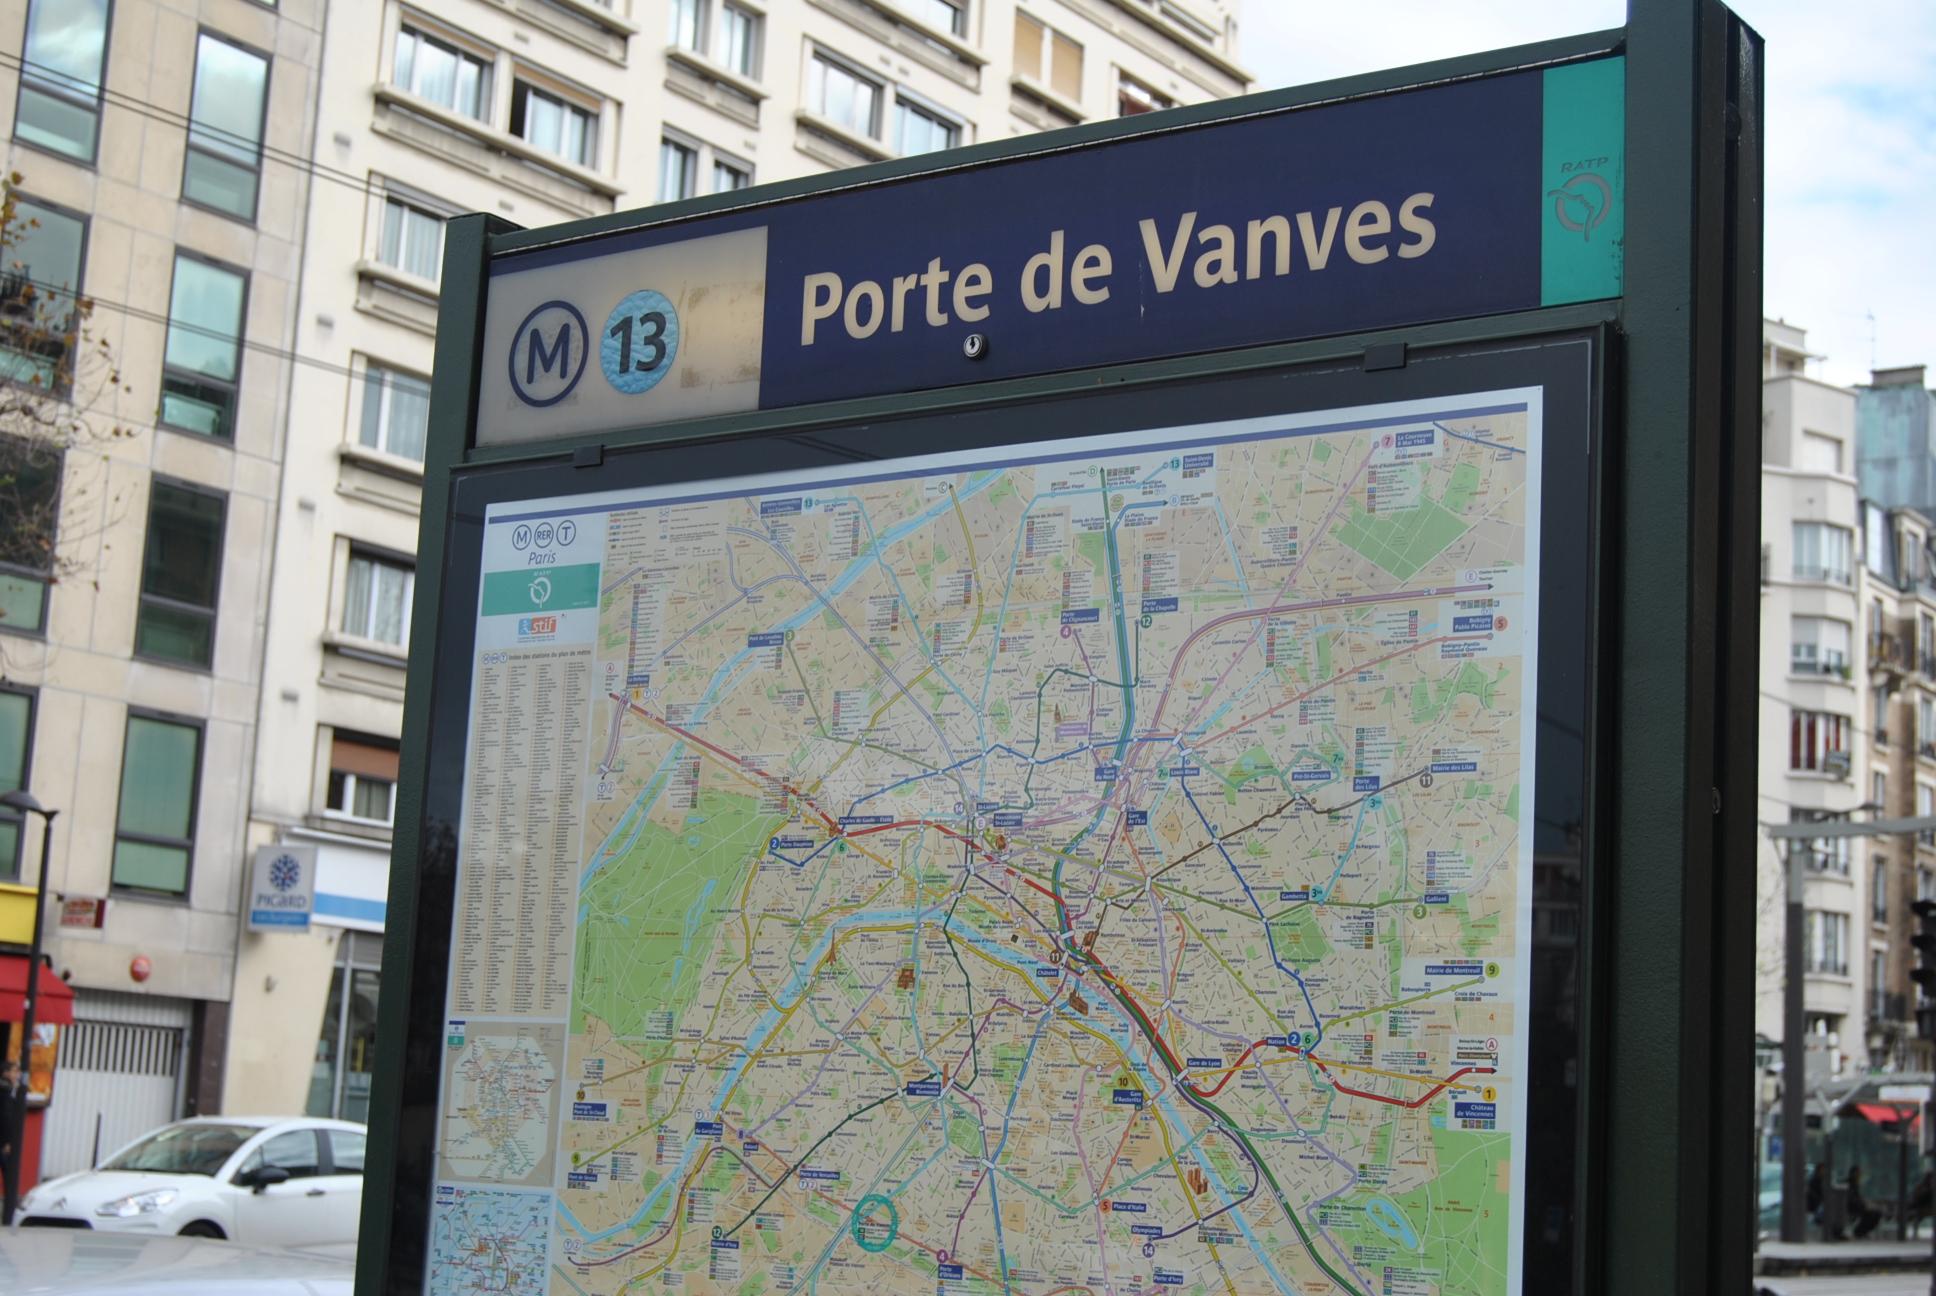 Porte de vanves metro my parisian lifemy parisian life - Conforama porte de vanves ...